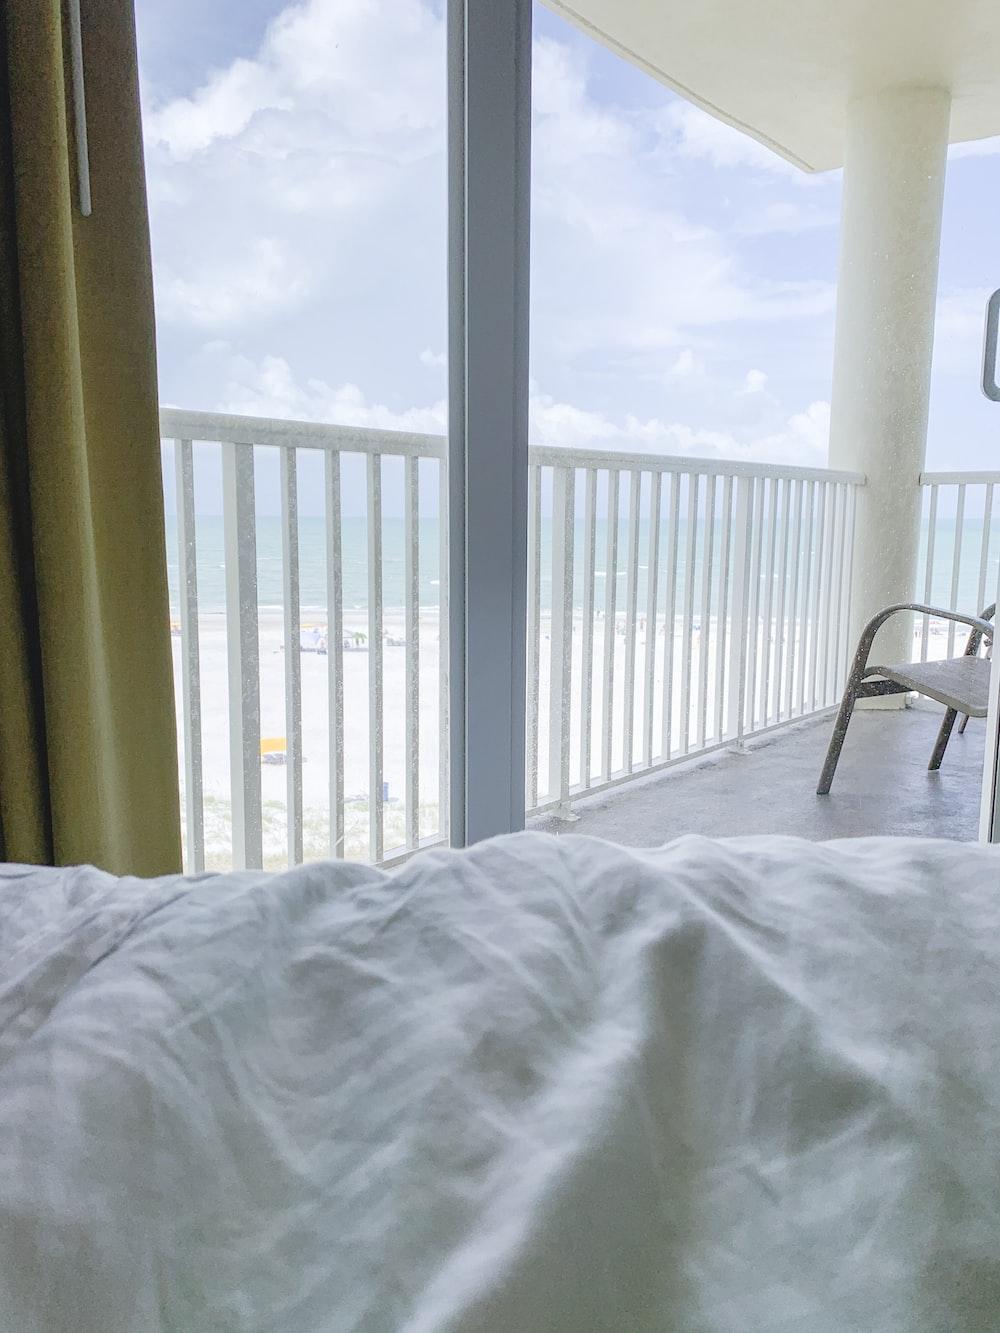 window overlooking a beach